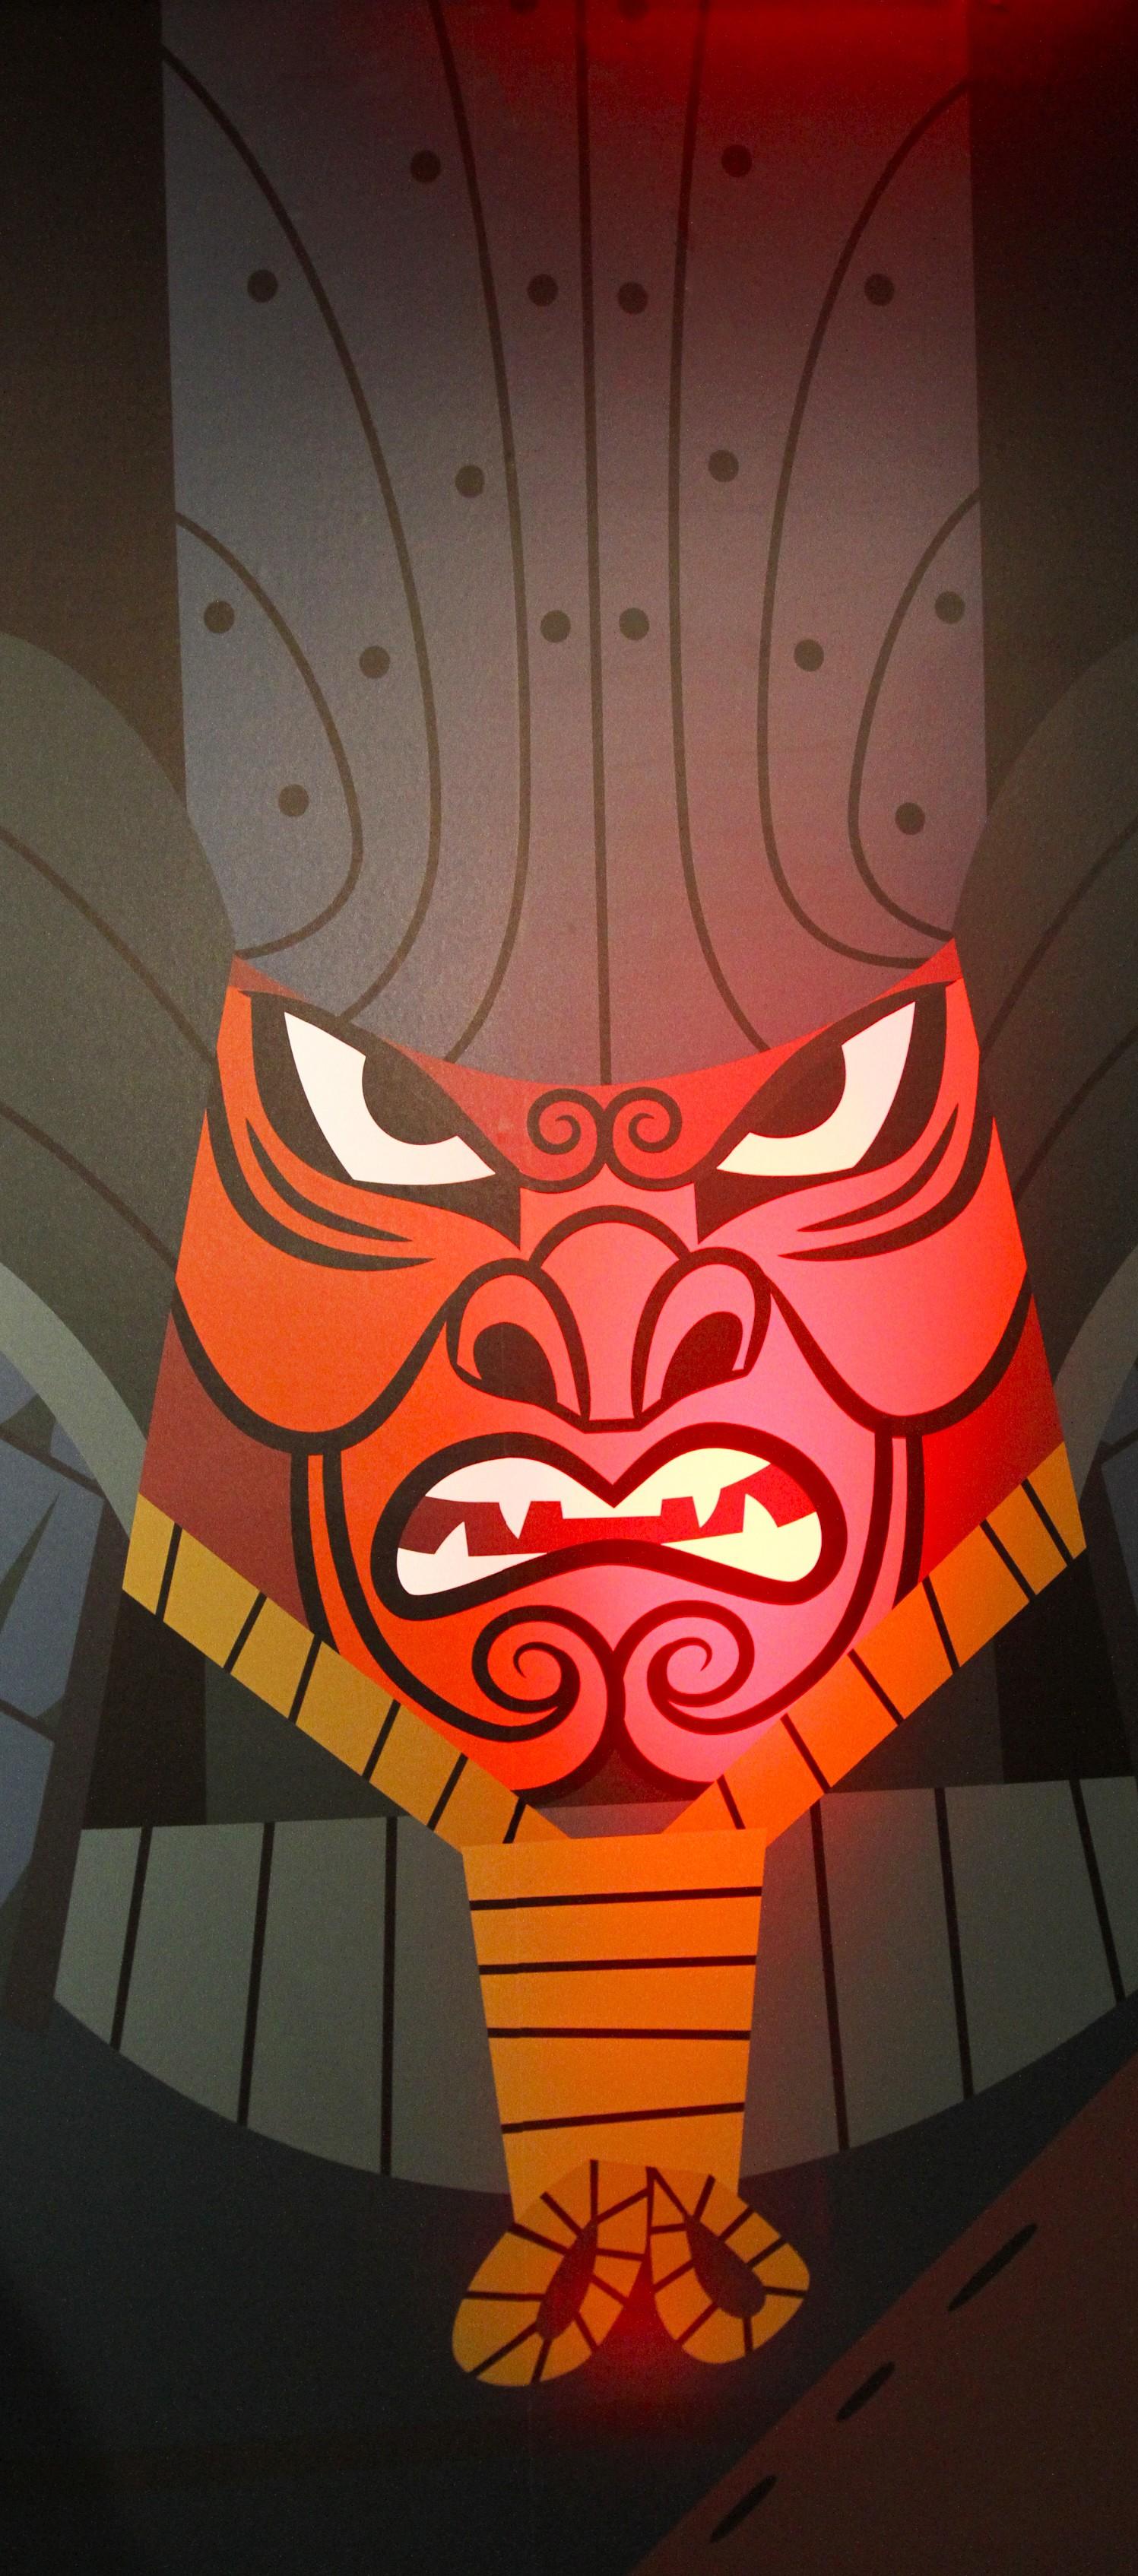 Hd Nirvana Wallpaper 47 Samurai Jack Backgrounds 183 ① Download Free Full Hd